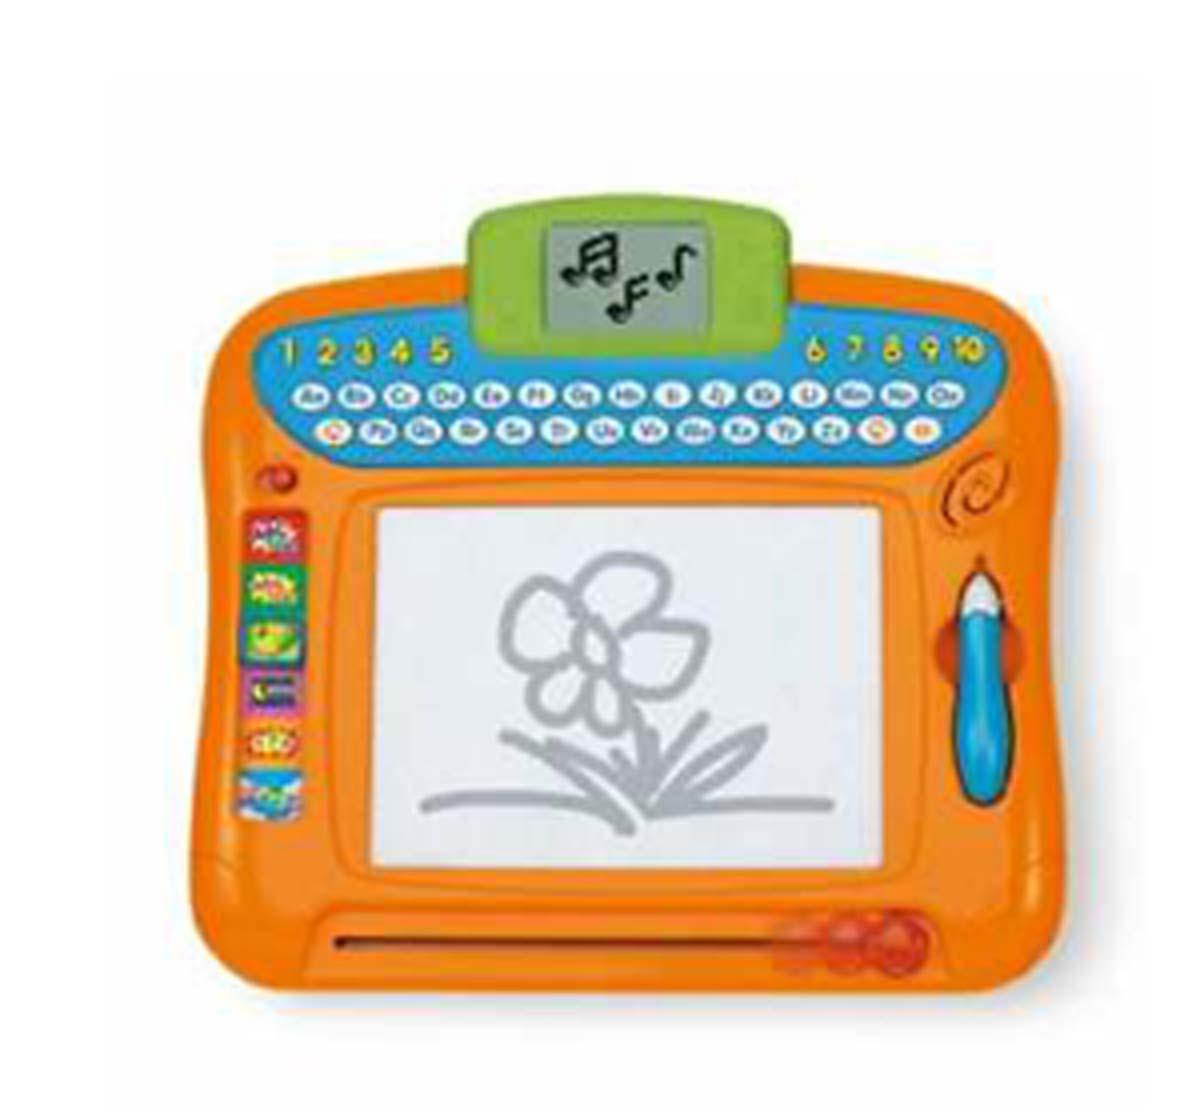 WinFun | Winfun Write N Draw Learning Board Toys for Kids age 2Y+